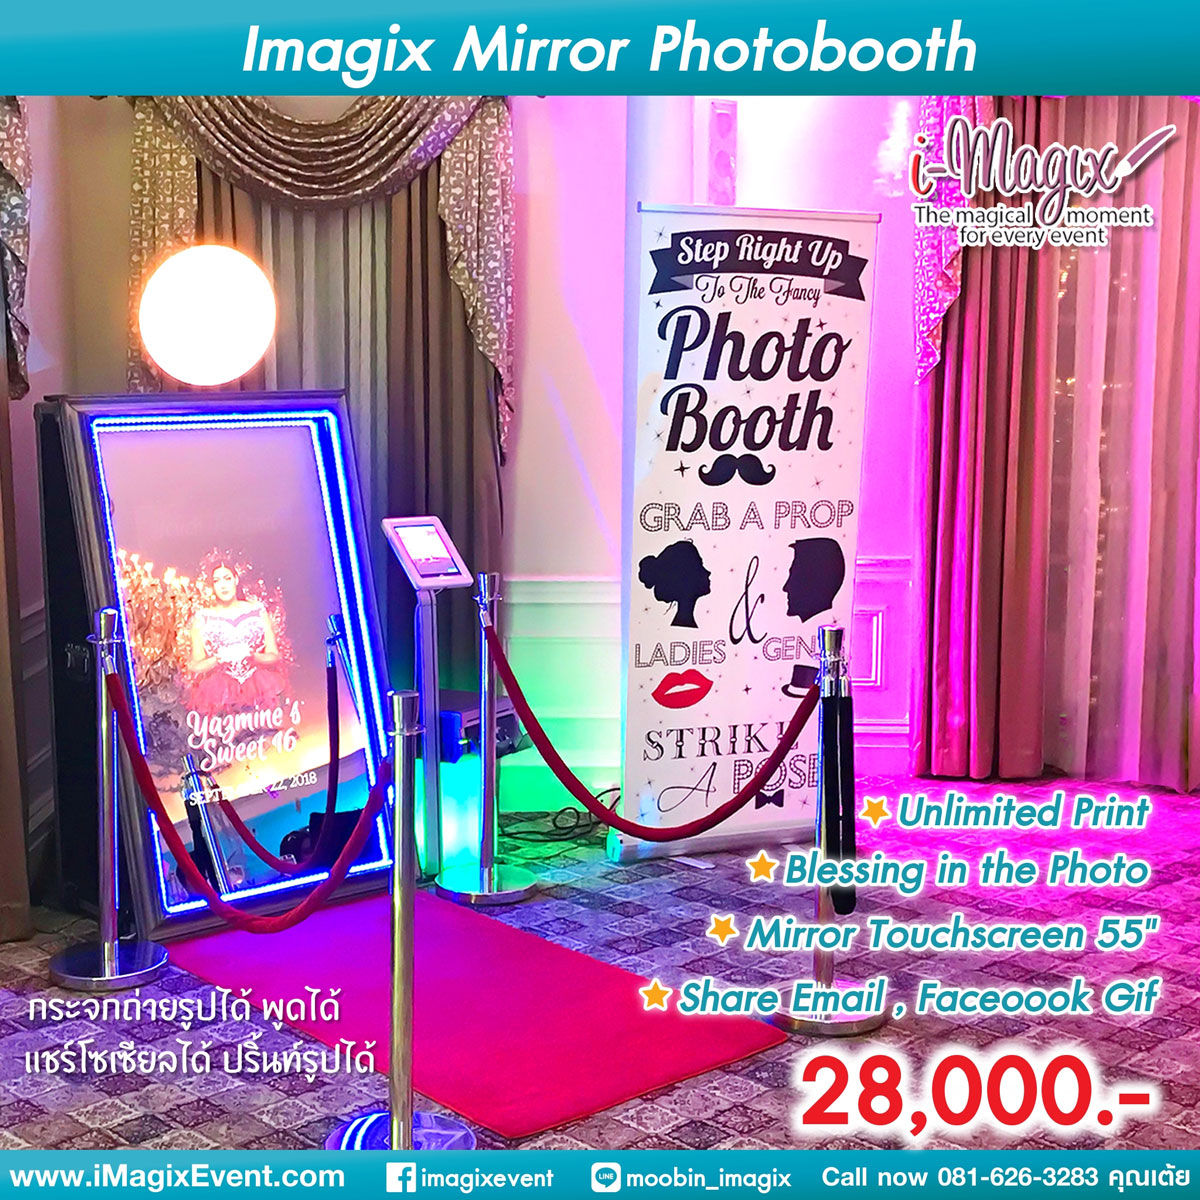 imagix-mirror-photobooth